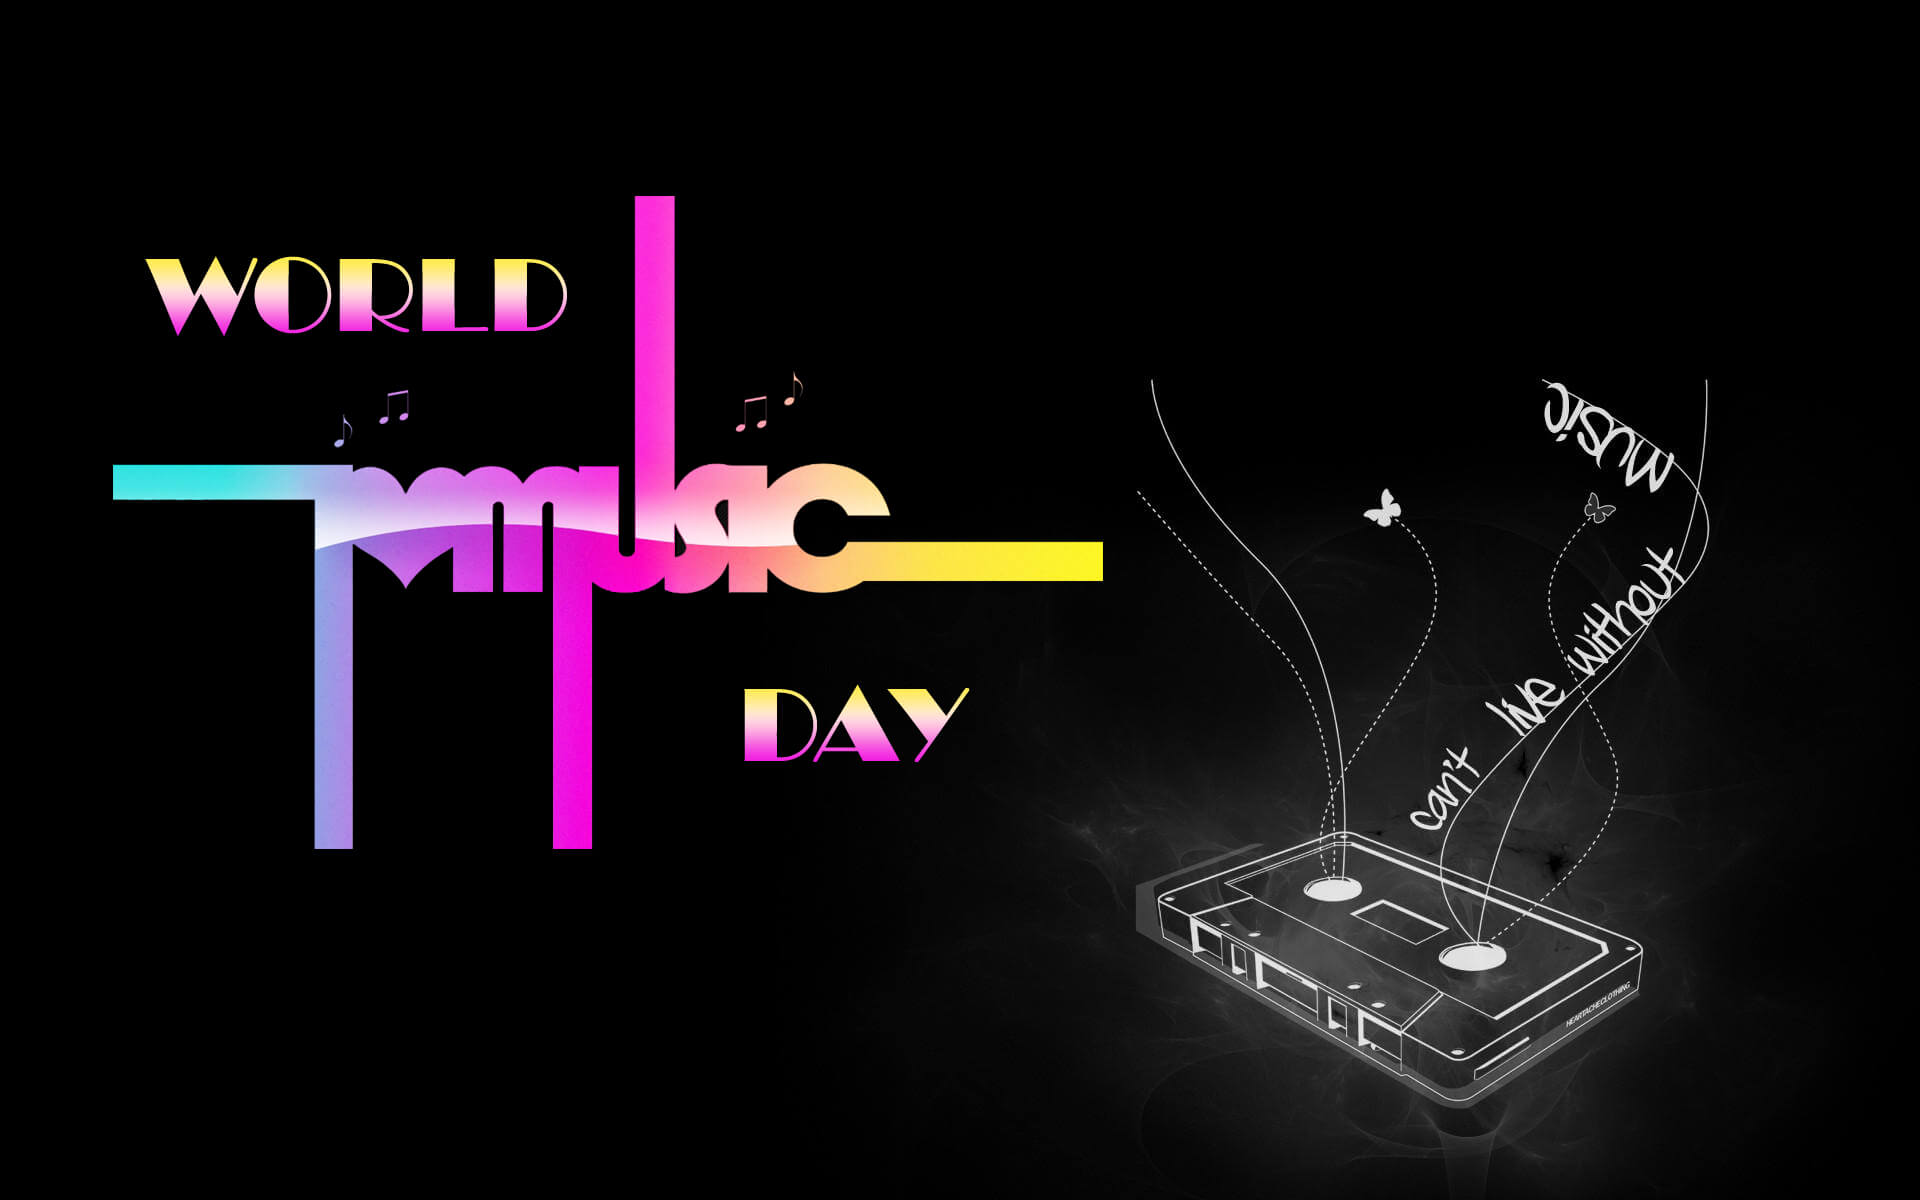 Happy World Music Day Cassette Hd Wallpaper 1920x1200